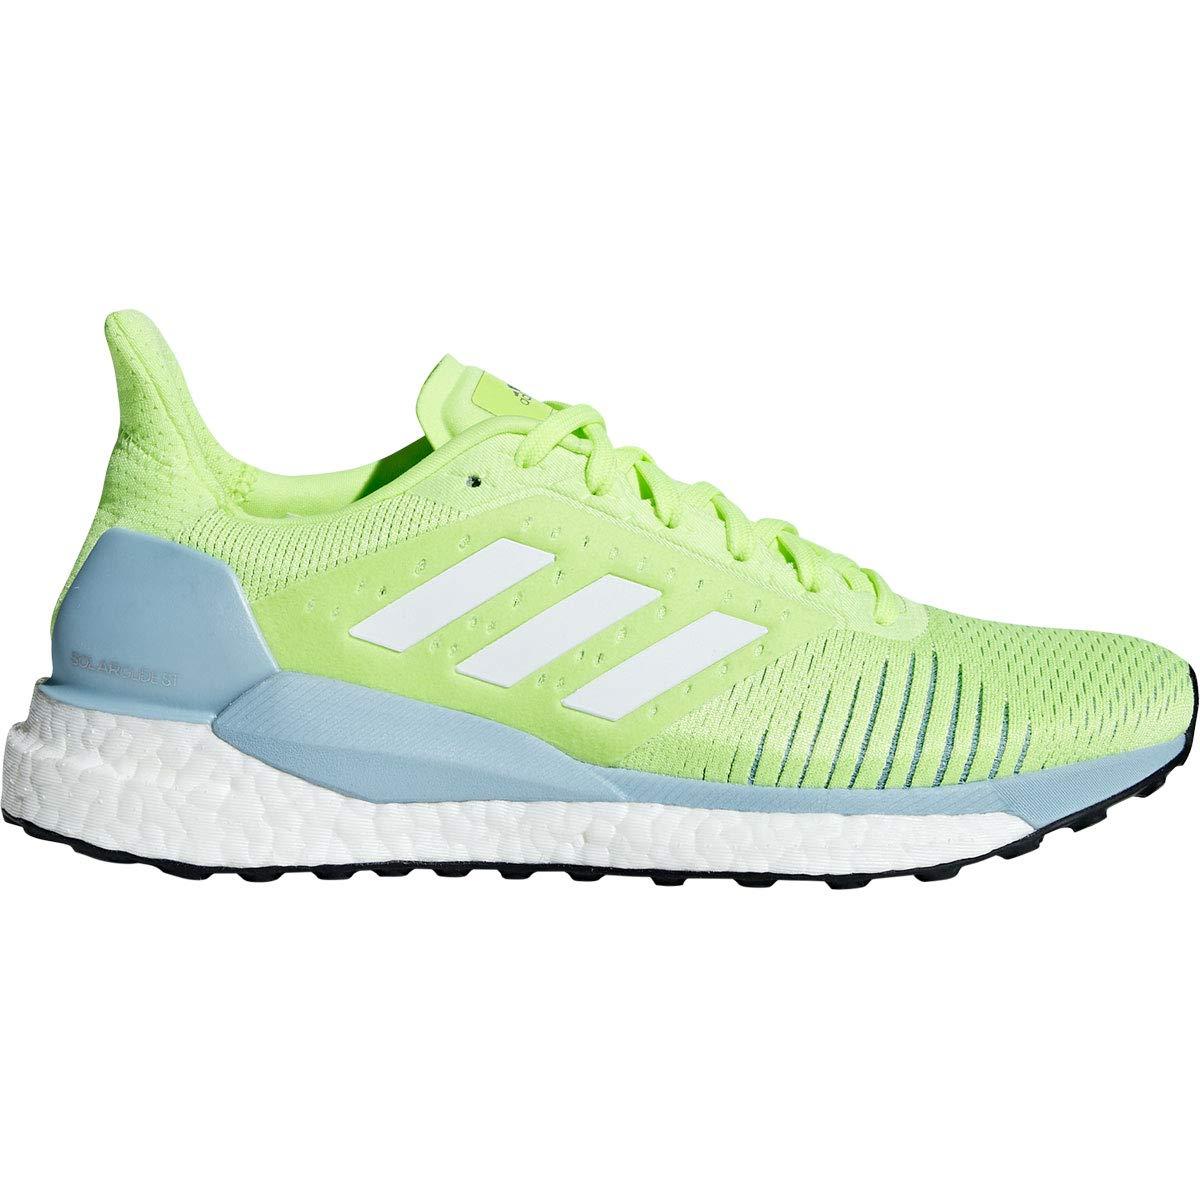 Adidas Performance Laufschuh Cosmic 2 W Neueste Schuhe Damen